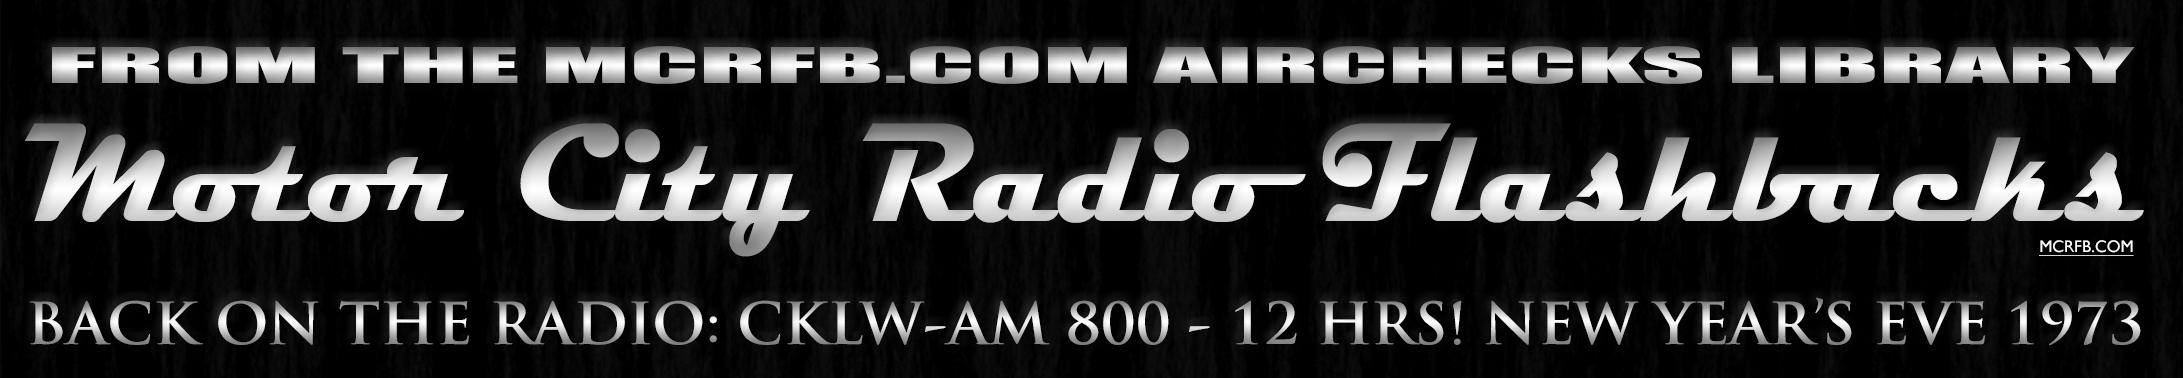 Motor City Radio Flashbacks Airchecks Blk Box (MCRFB CKLW-AM 1973)